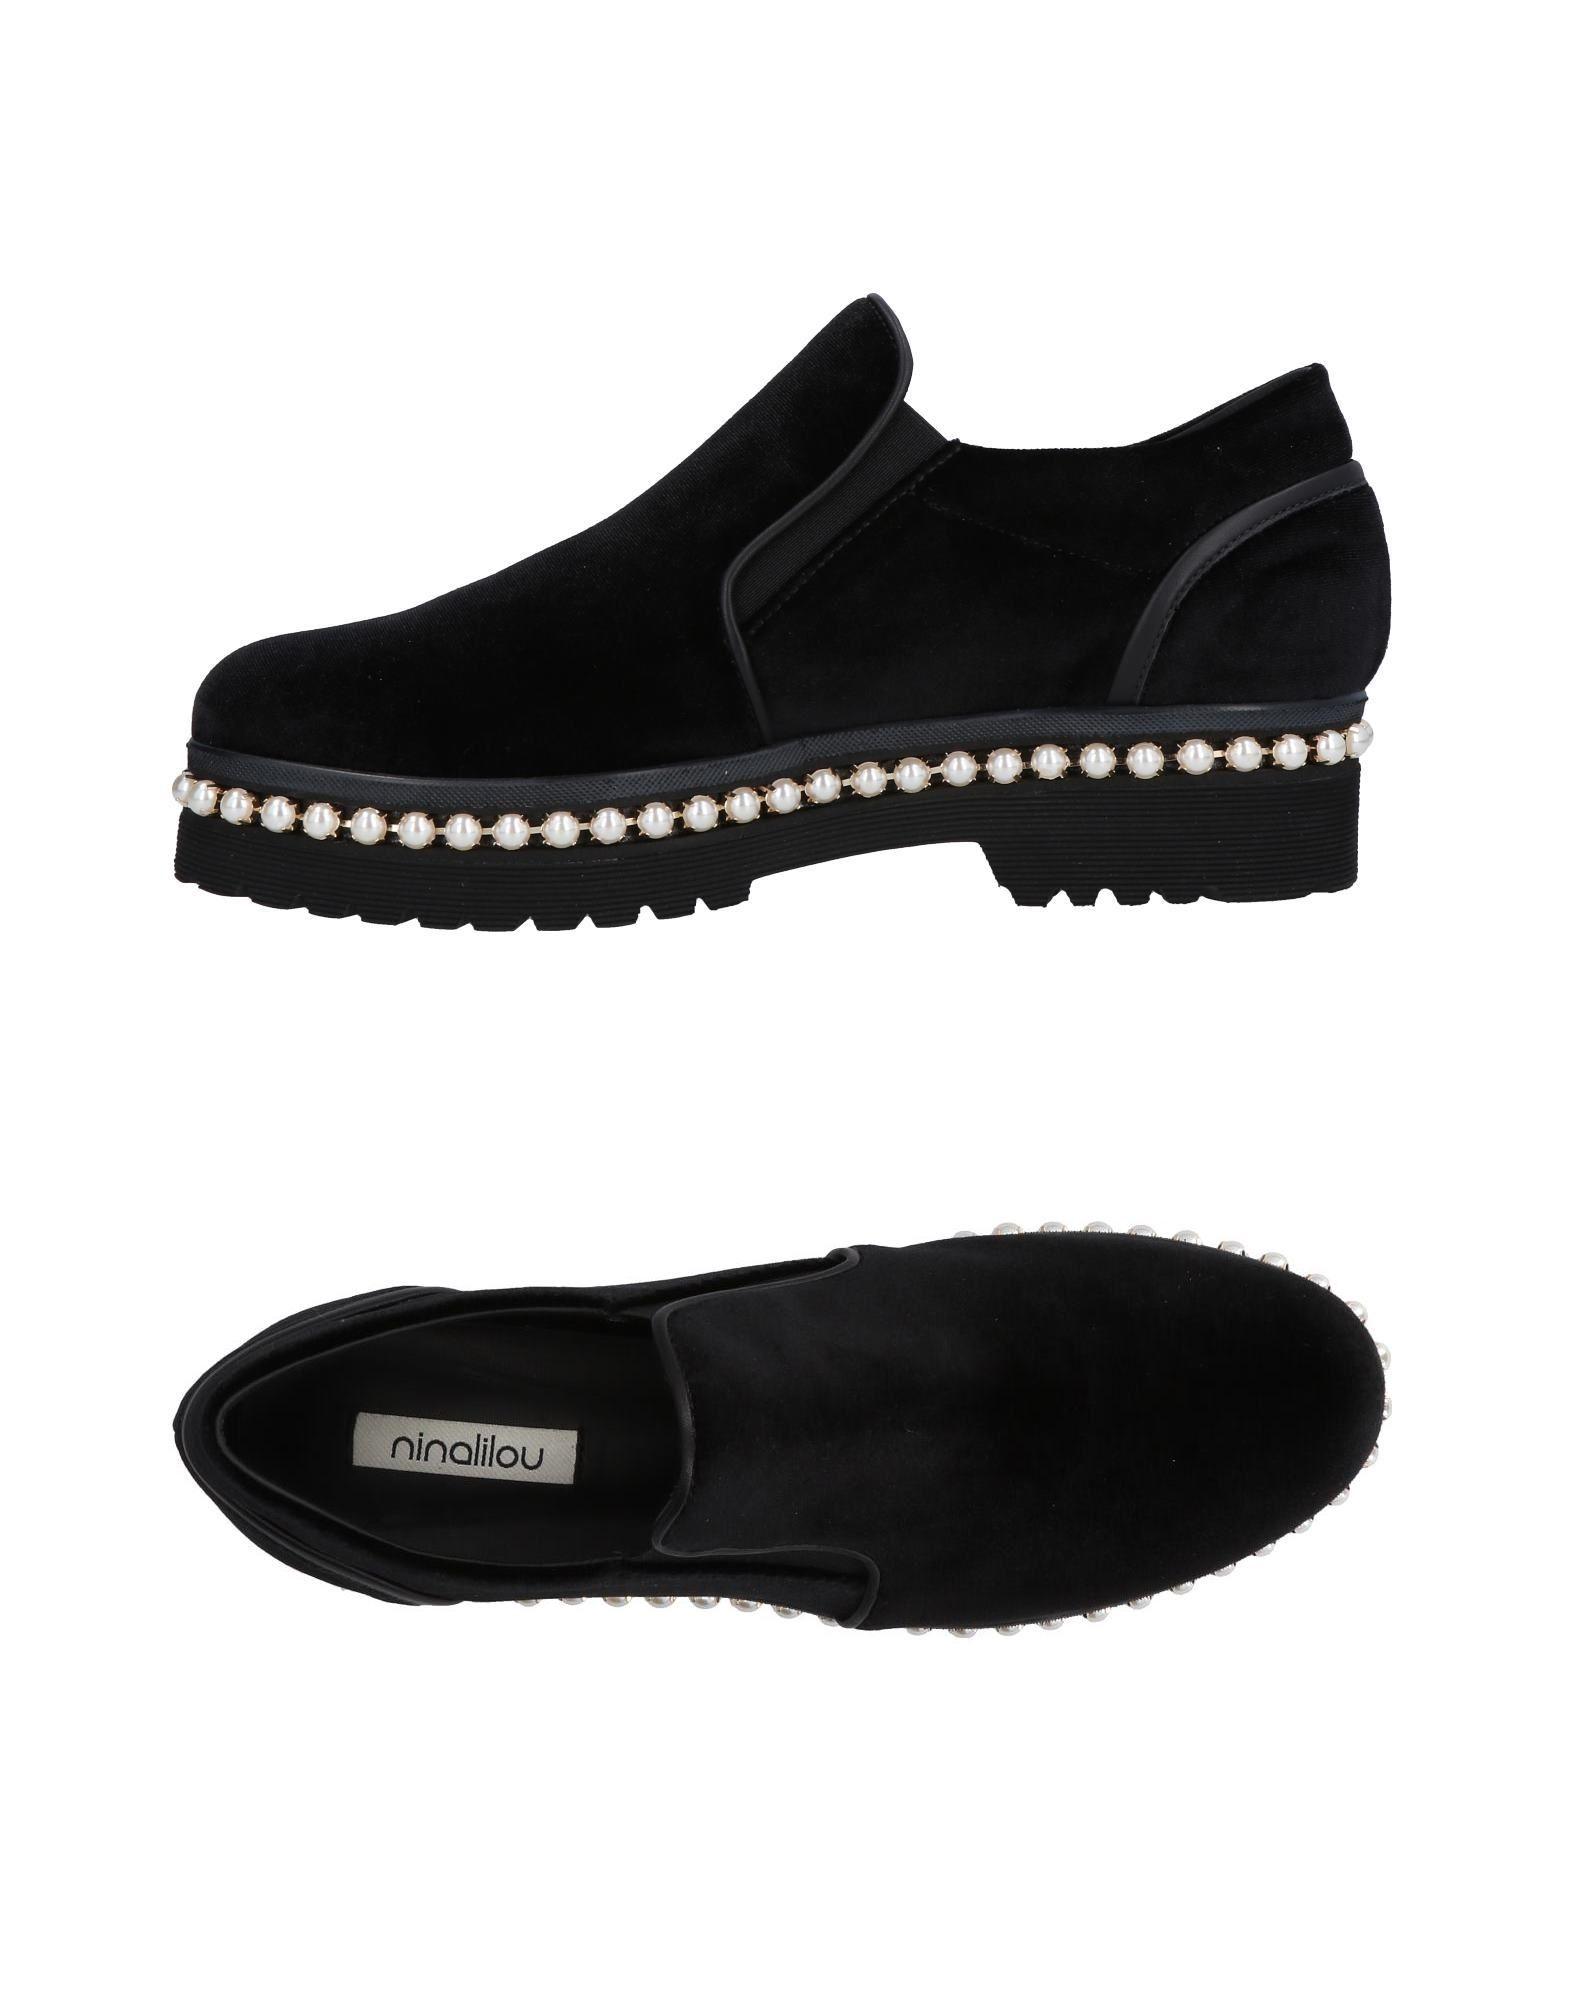 Stilvolle billige Schuhe Ninalilou Mokassins Damen  11473983XV